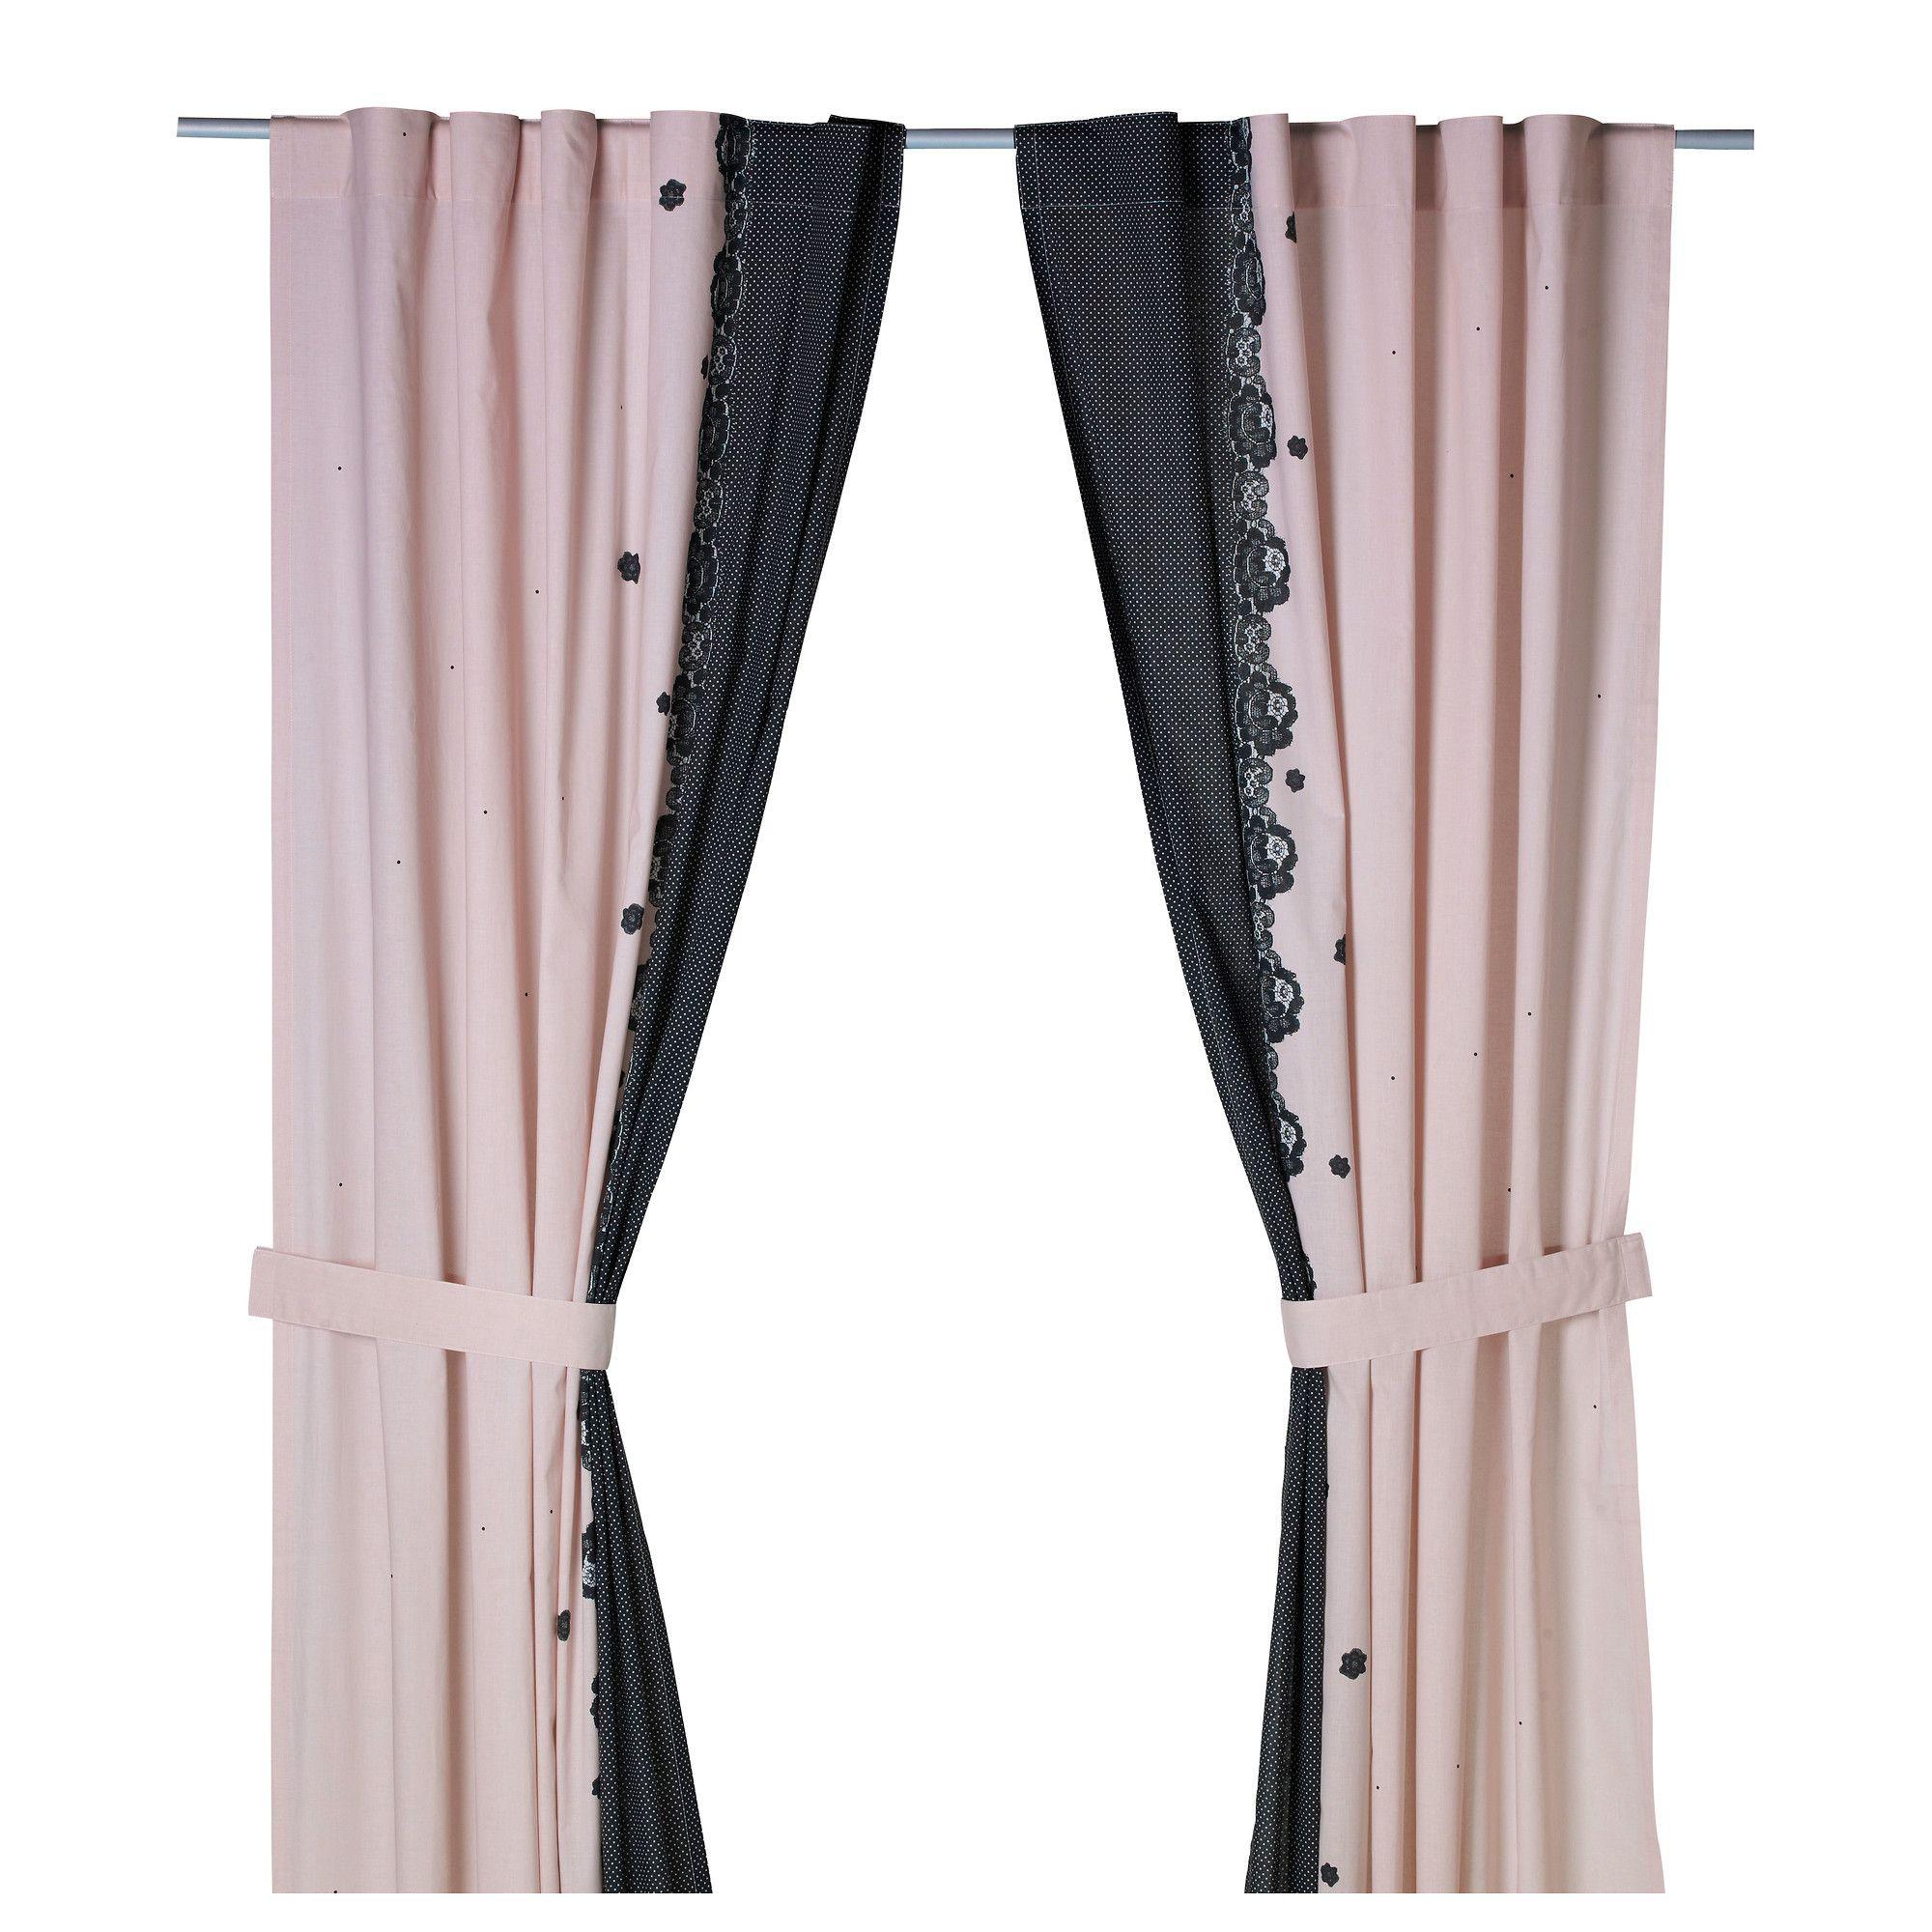 interesting charmerande rideau avec embrasse ikea with rideau dentelle ikea. Black Bedroom Furniture Sets. Home Design Ideas